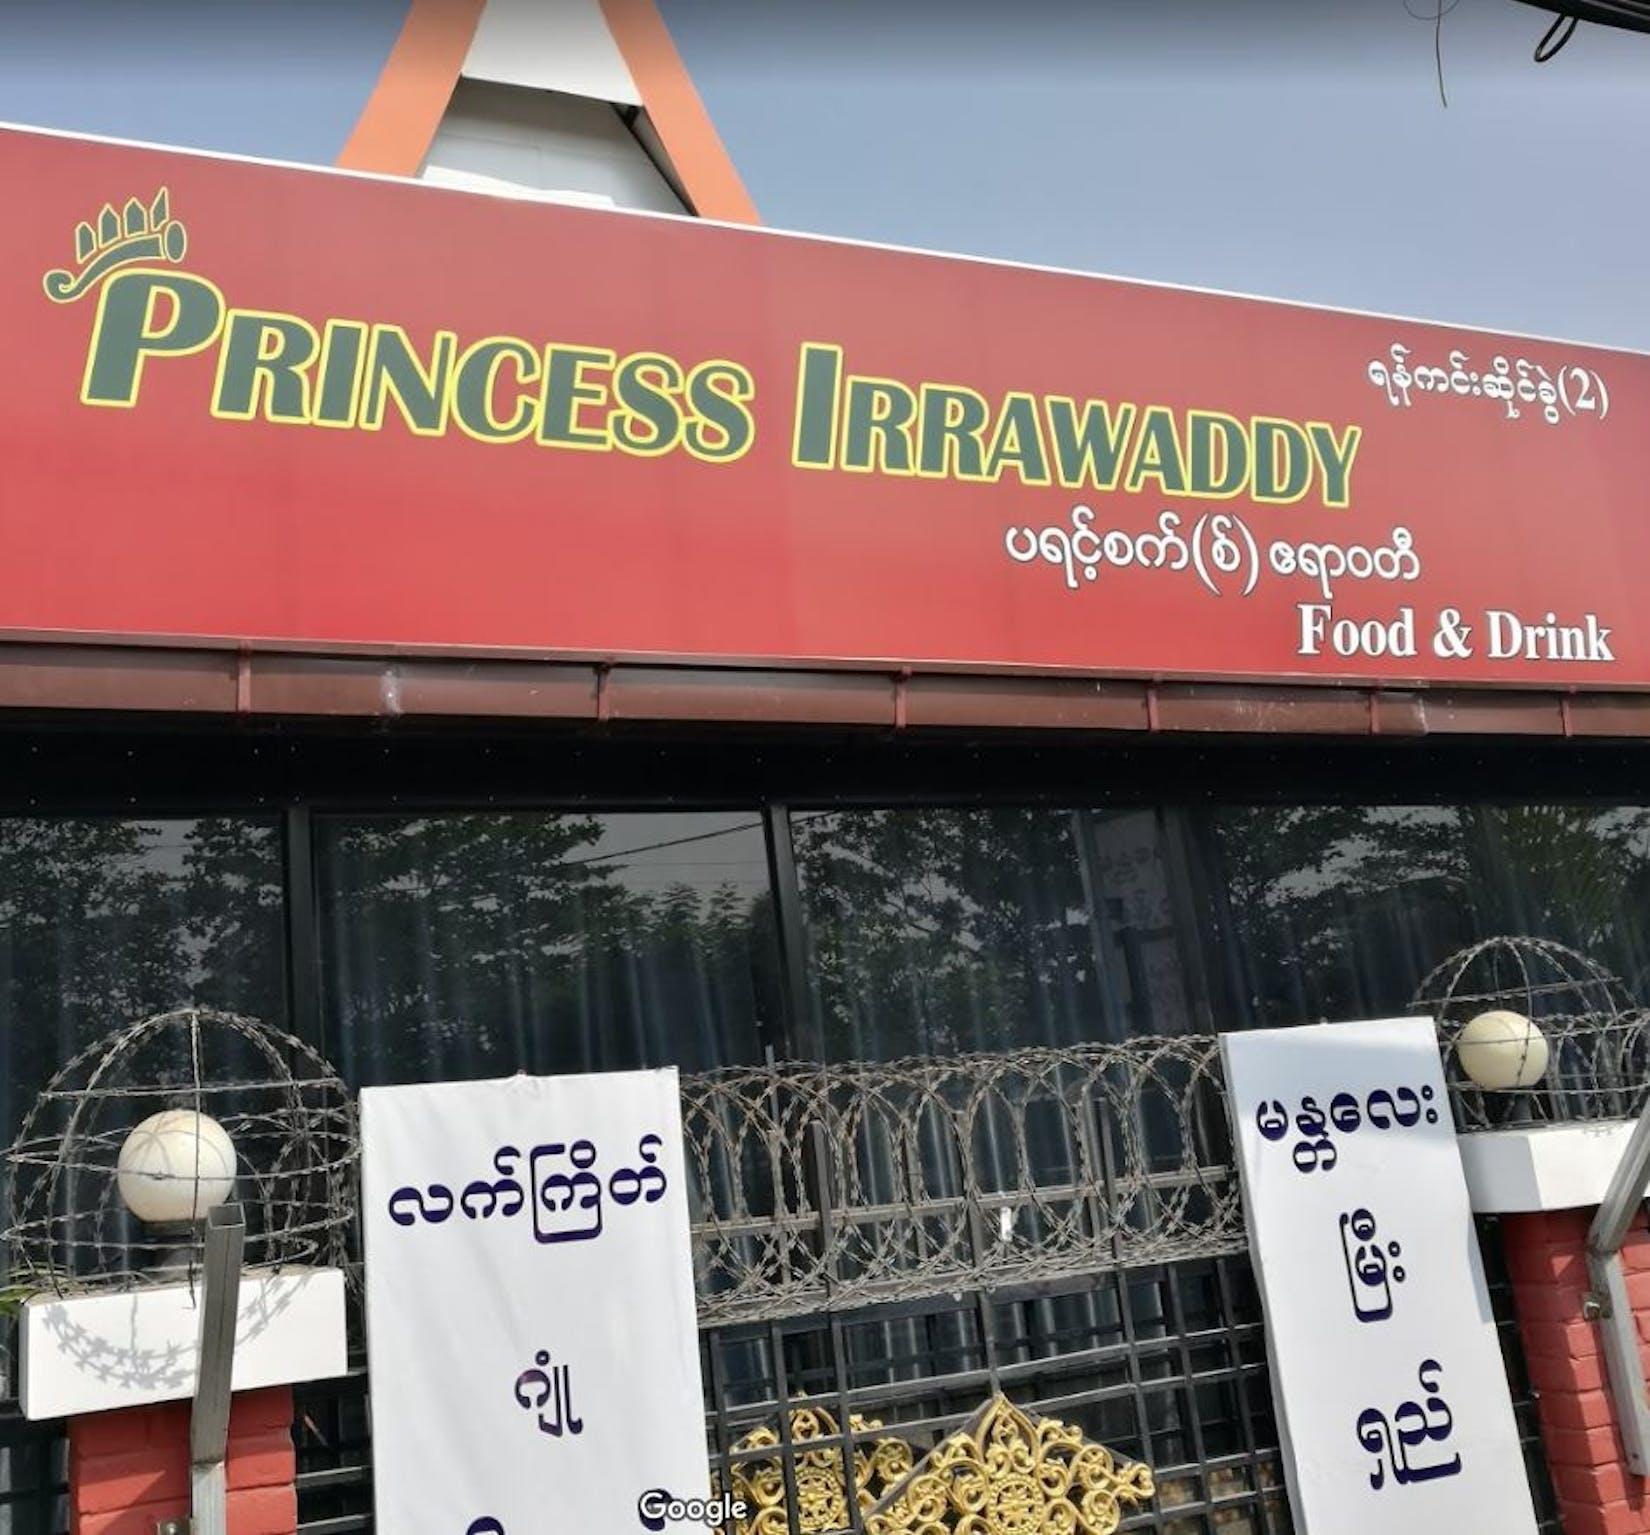 Princess Irrawaddy Thuwunna Breakfast Special | yathar